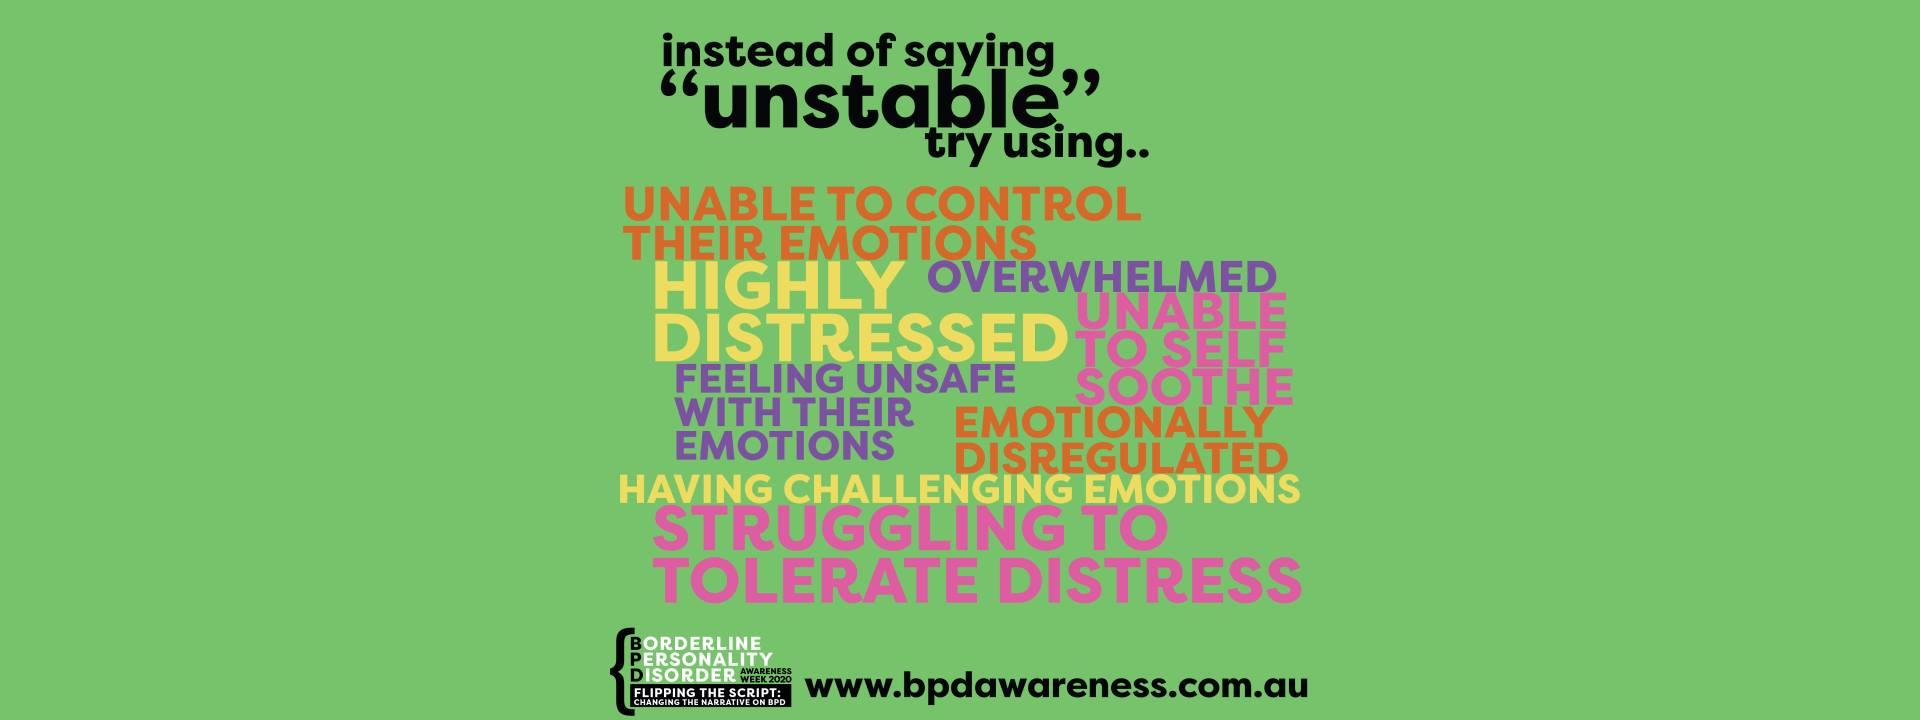 BPD Awareness Week - Not Unstable